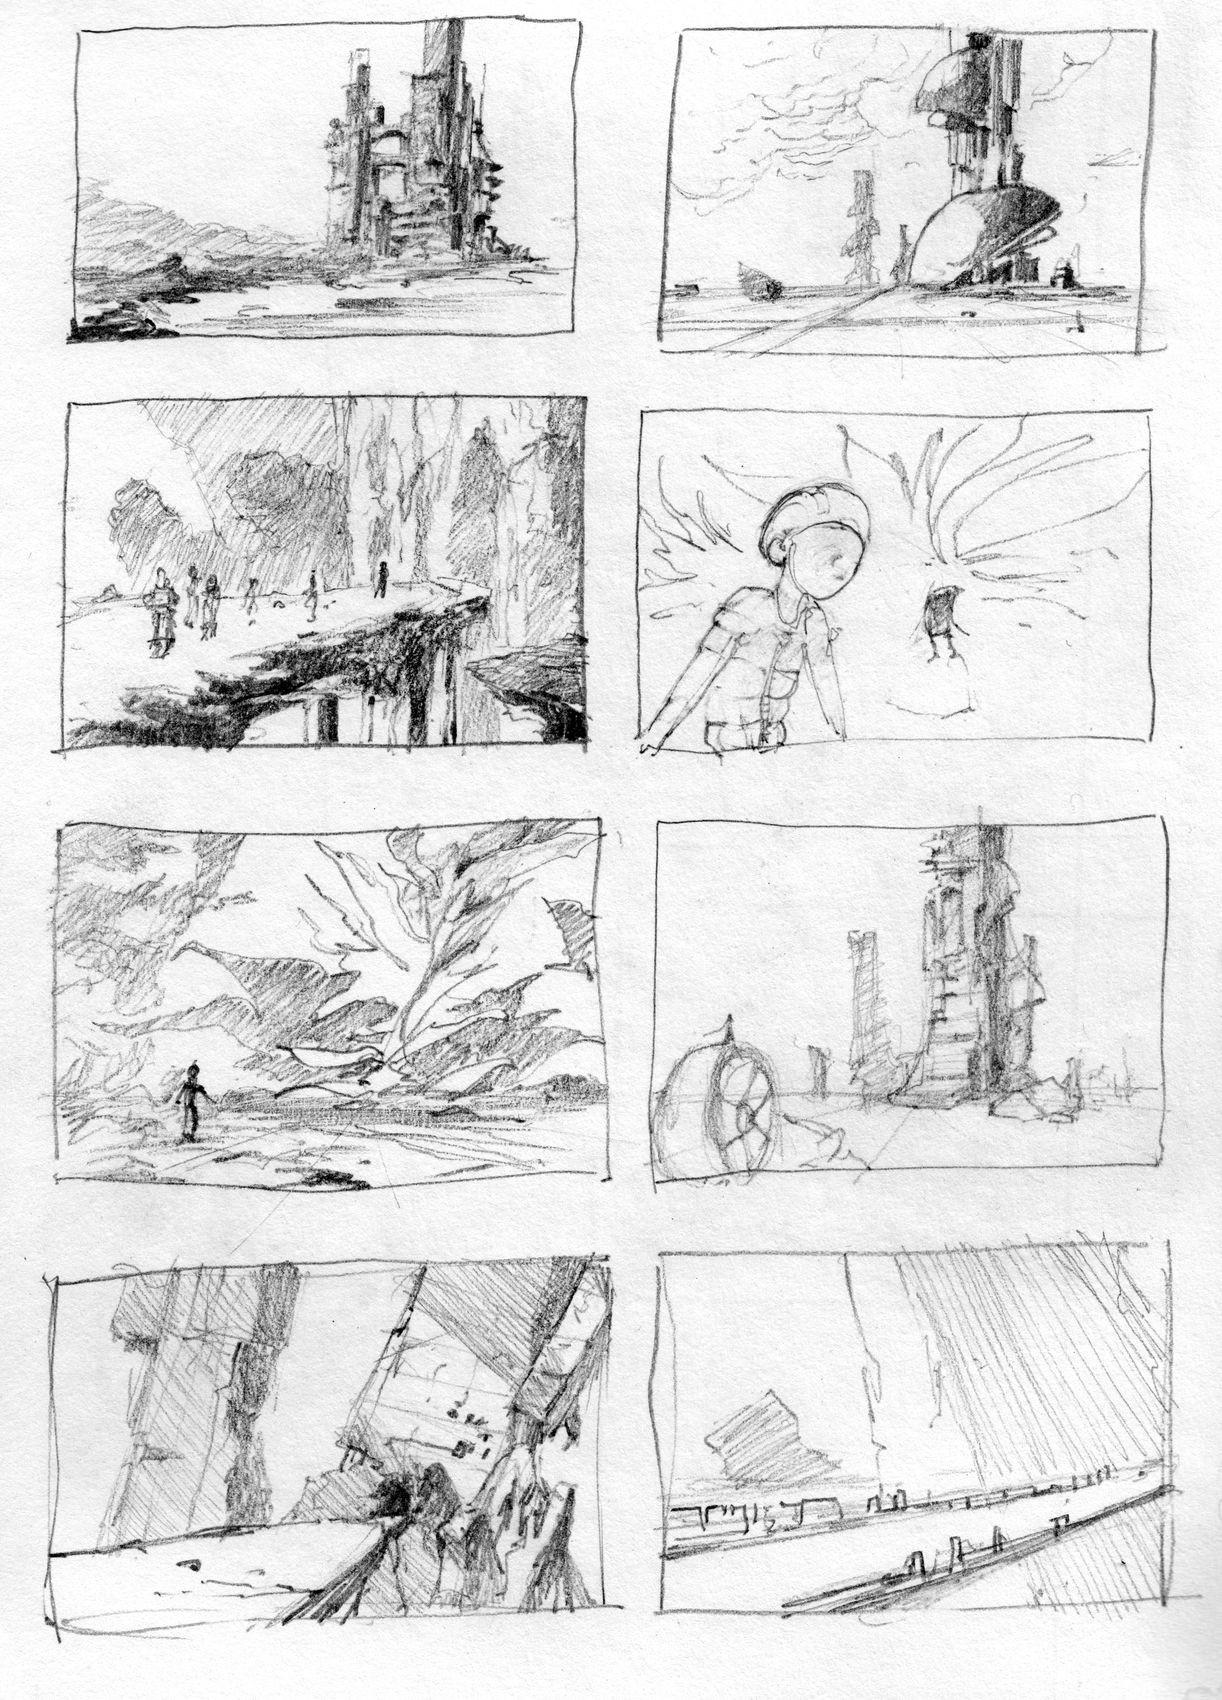 Stijn windig thumbnails 01 small